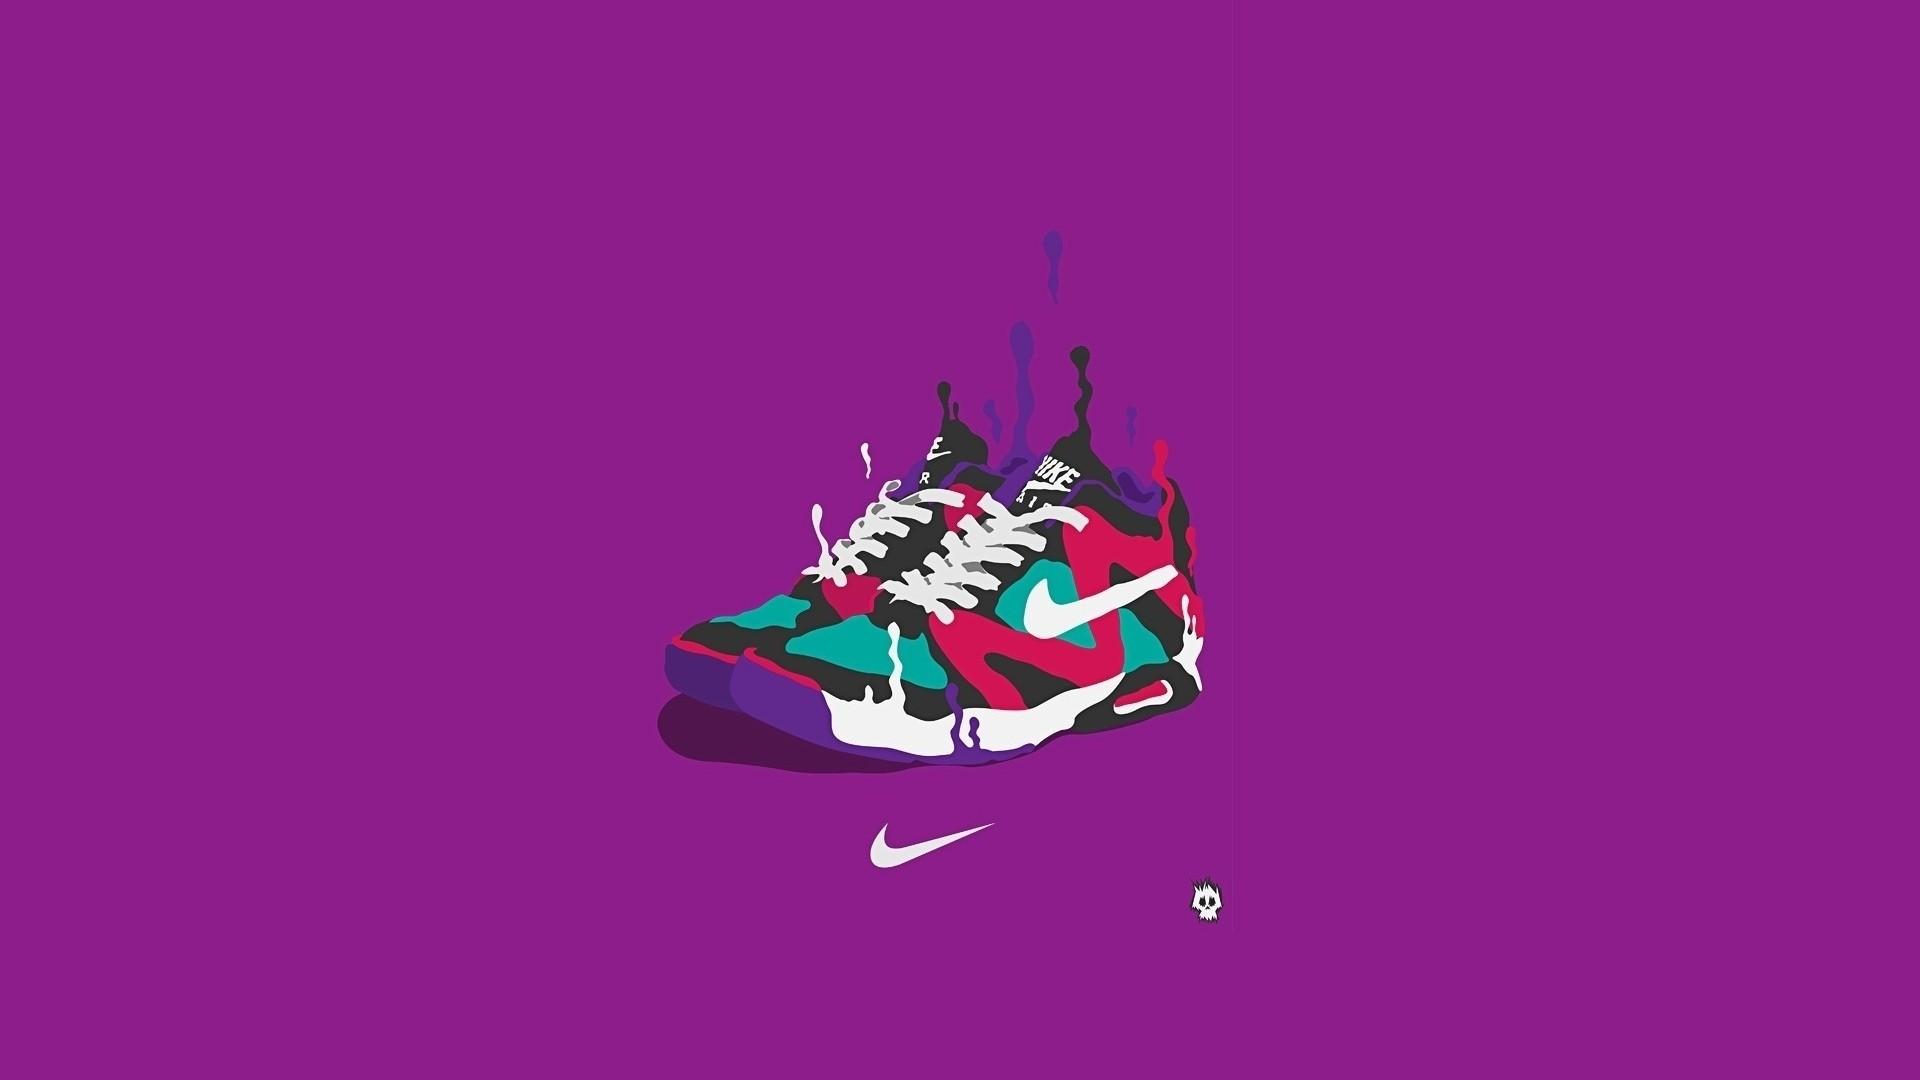 73 Nike Wallpaper Hd 1080p